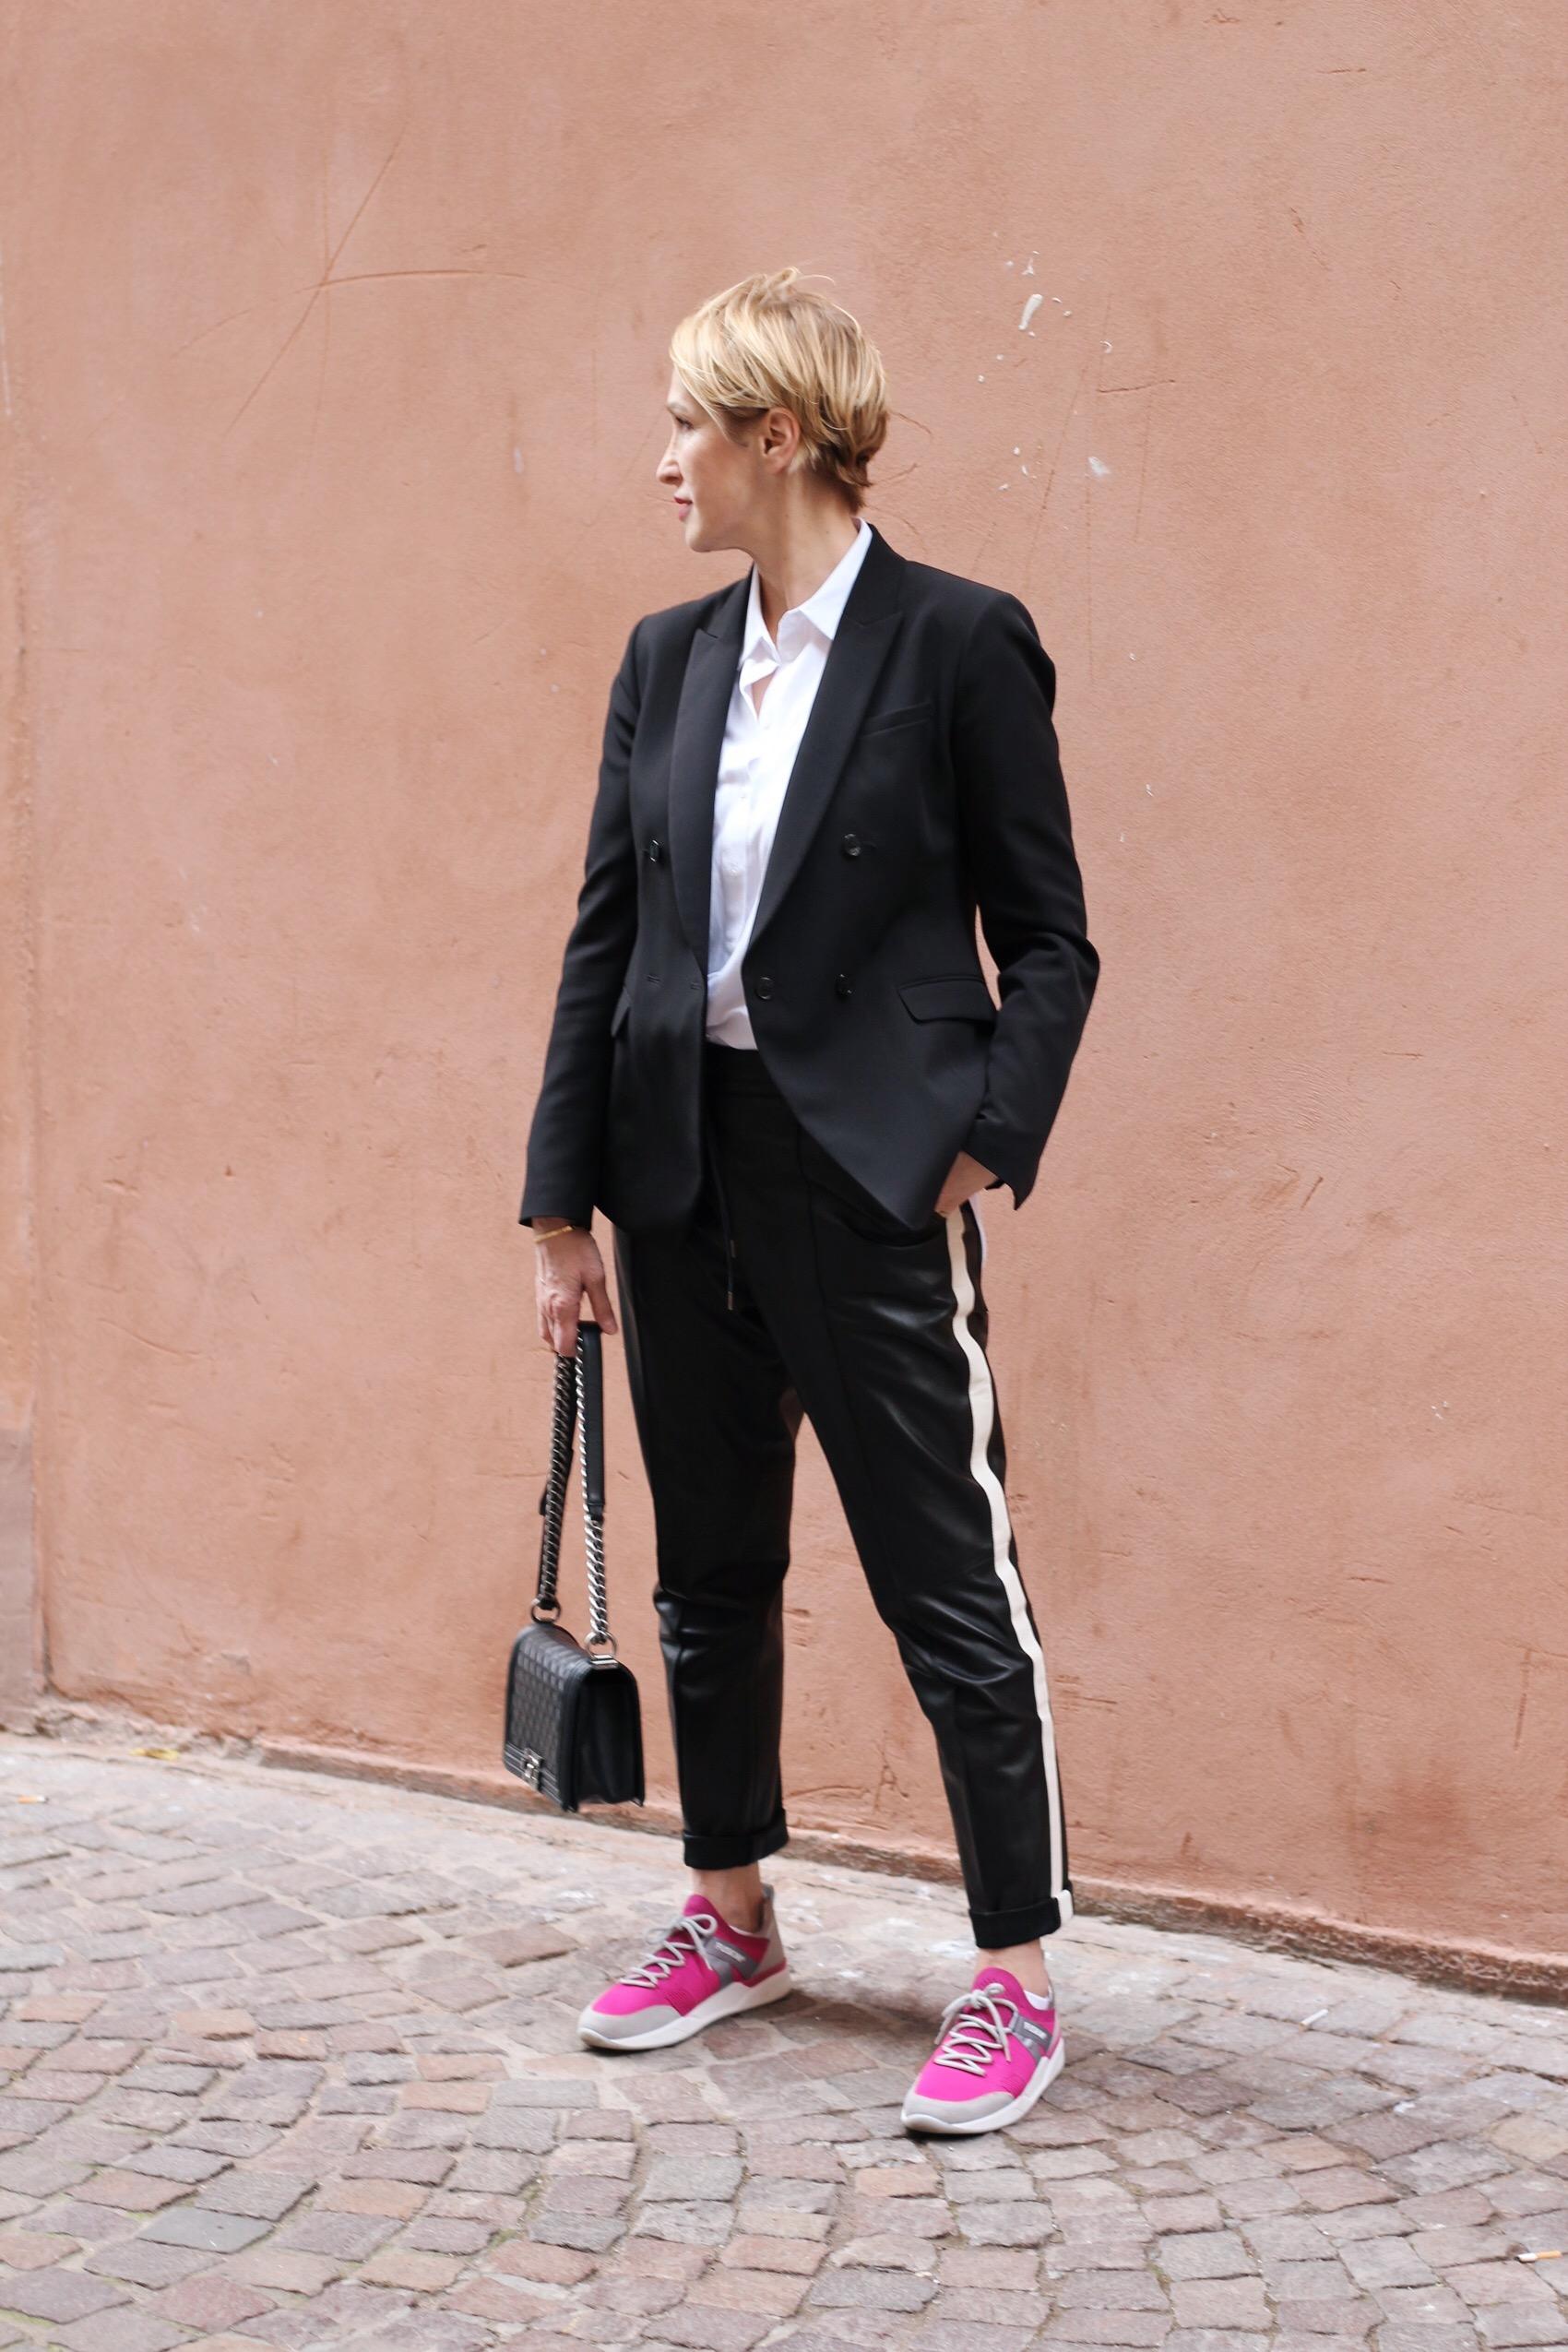 glamupyourlifestyle lederhose blazer klassischer-blazer büro-Outfit athleisure-trend ü-40-blog ü-50-blog ue-40-blog ue-50-blog